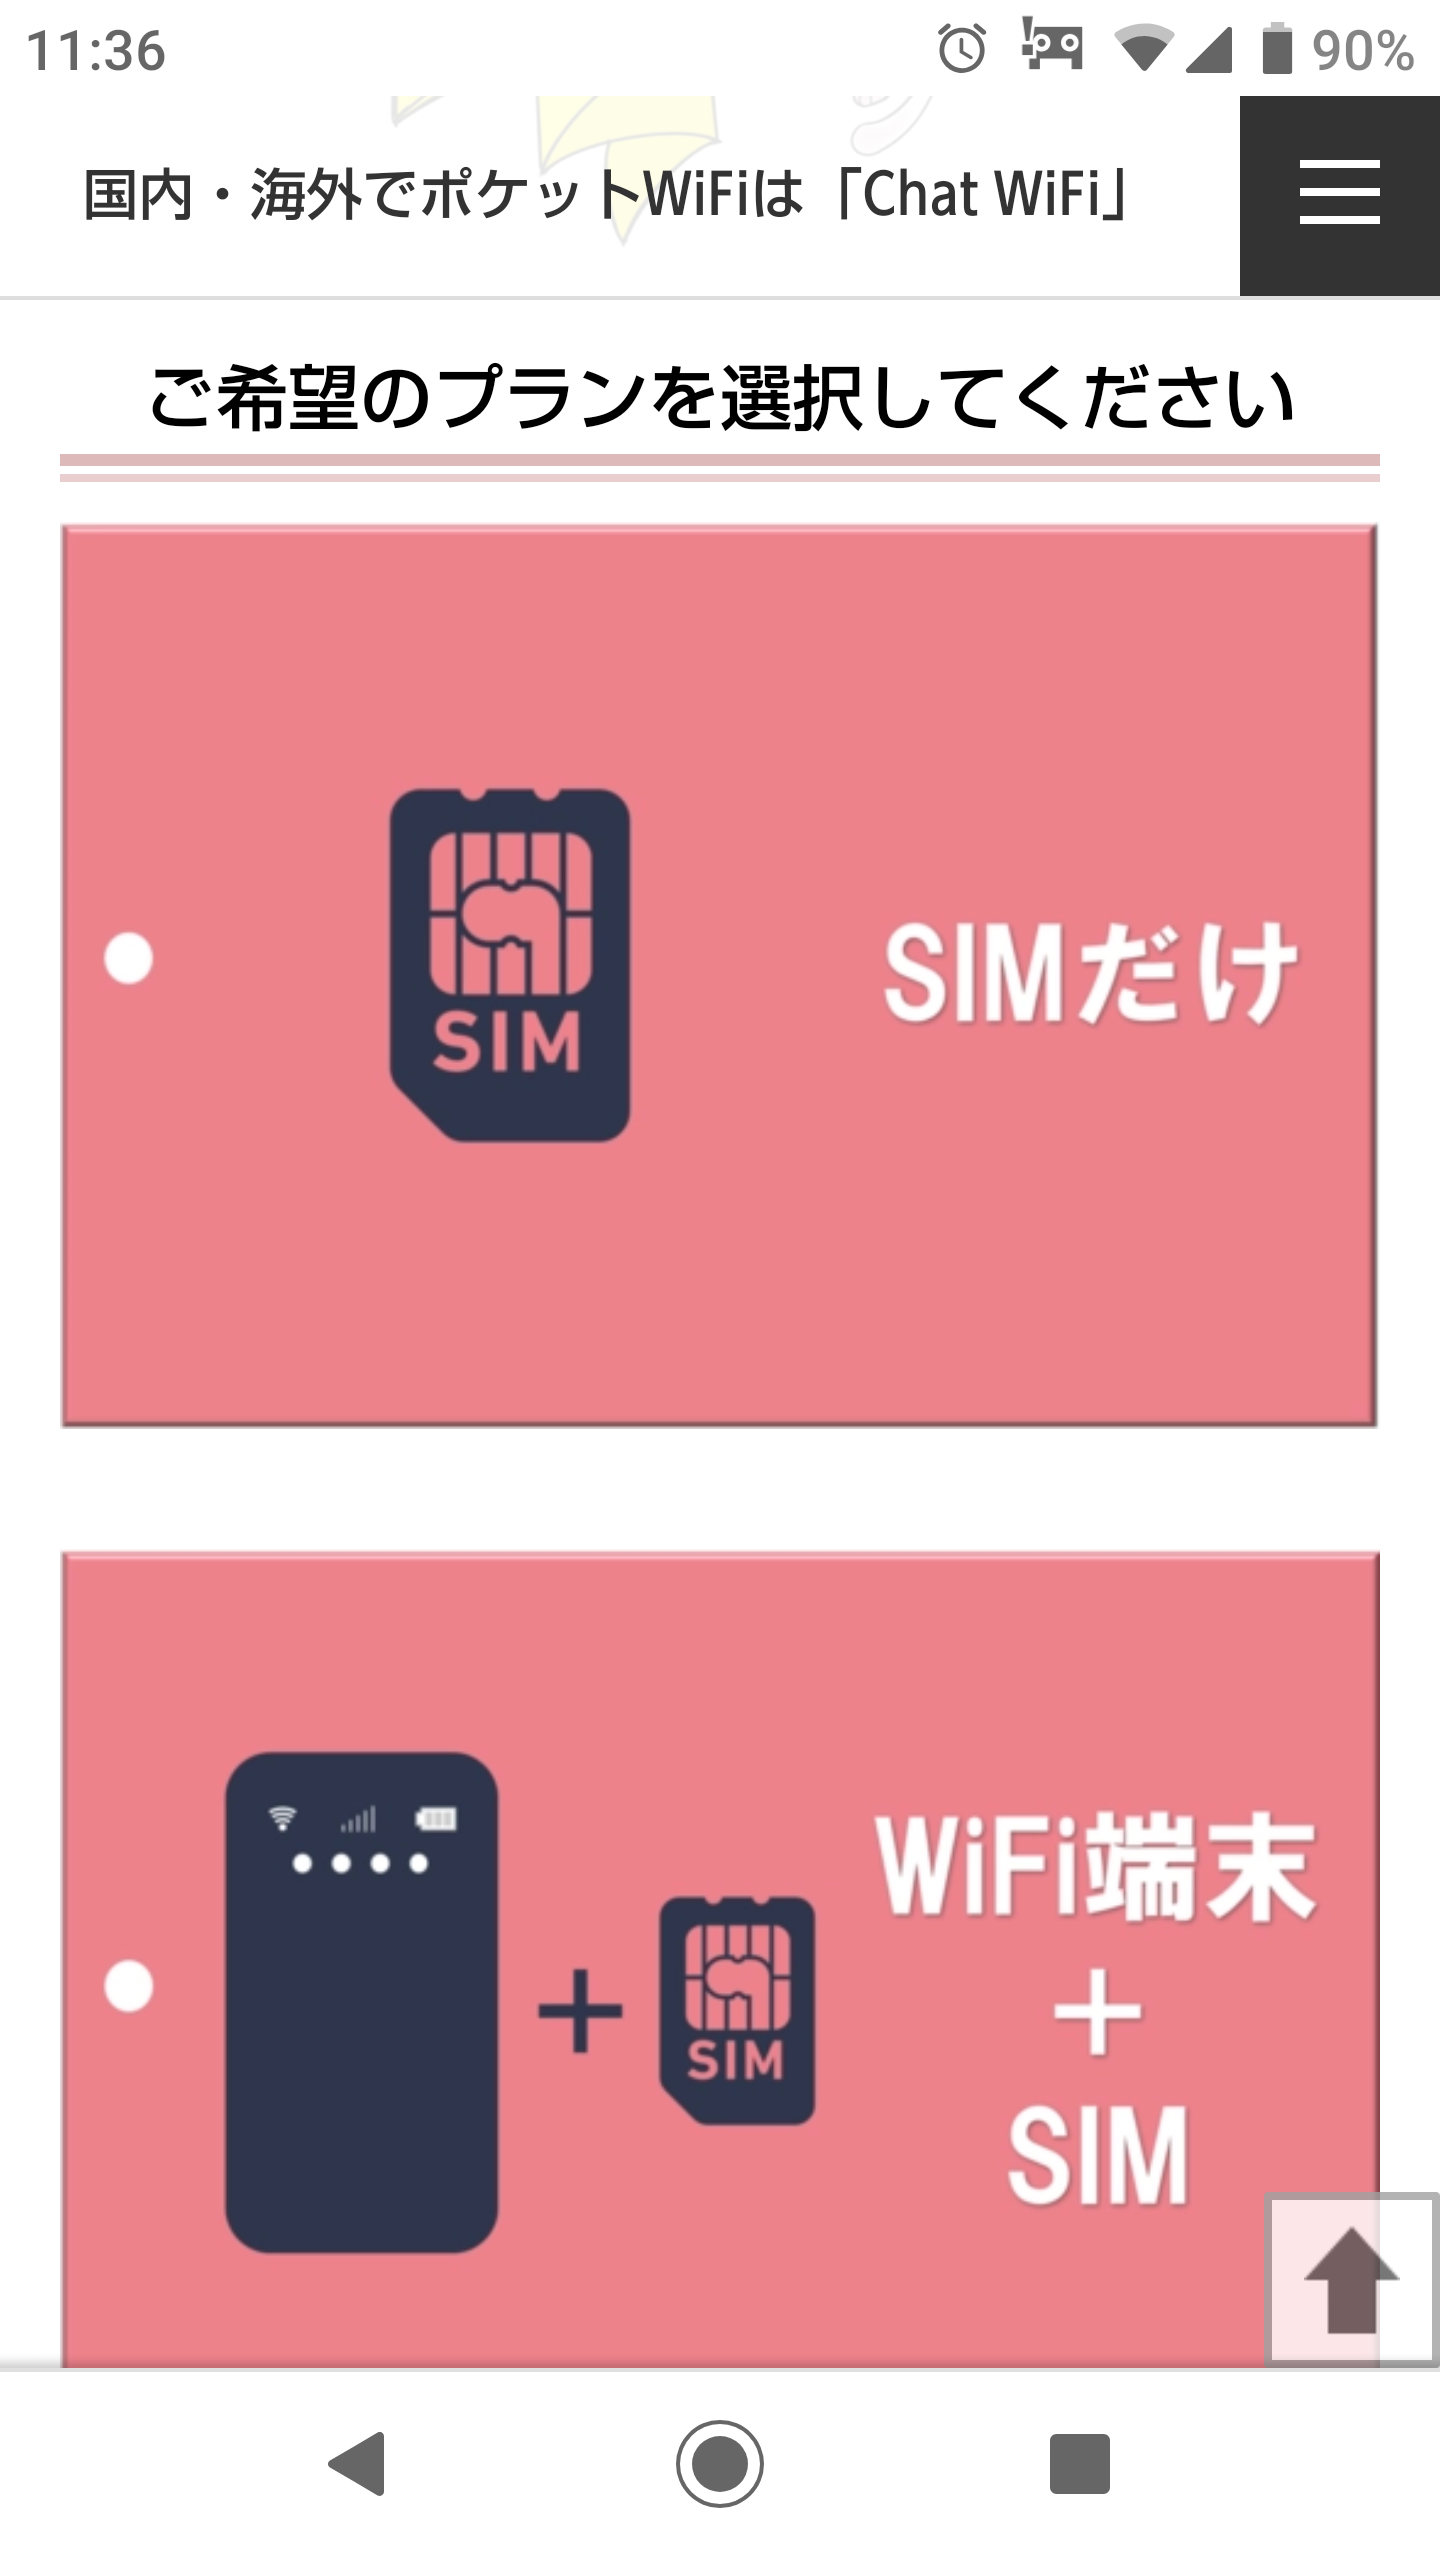 ChatWiFi手順1